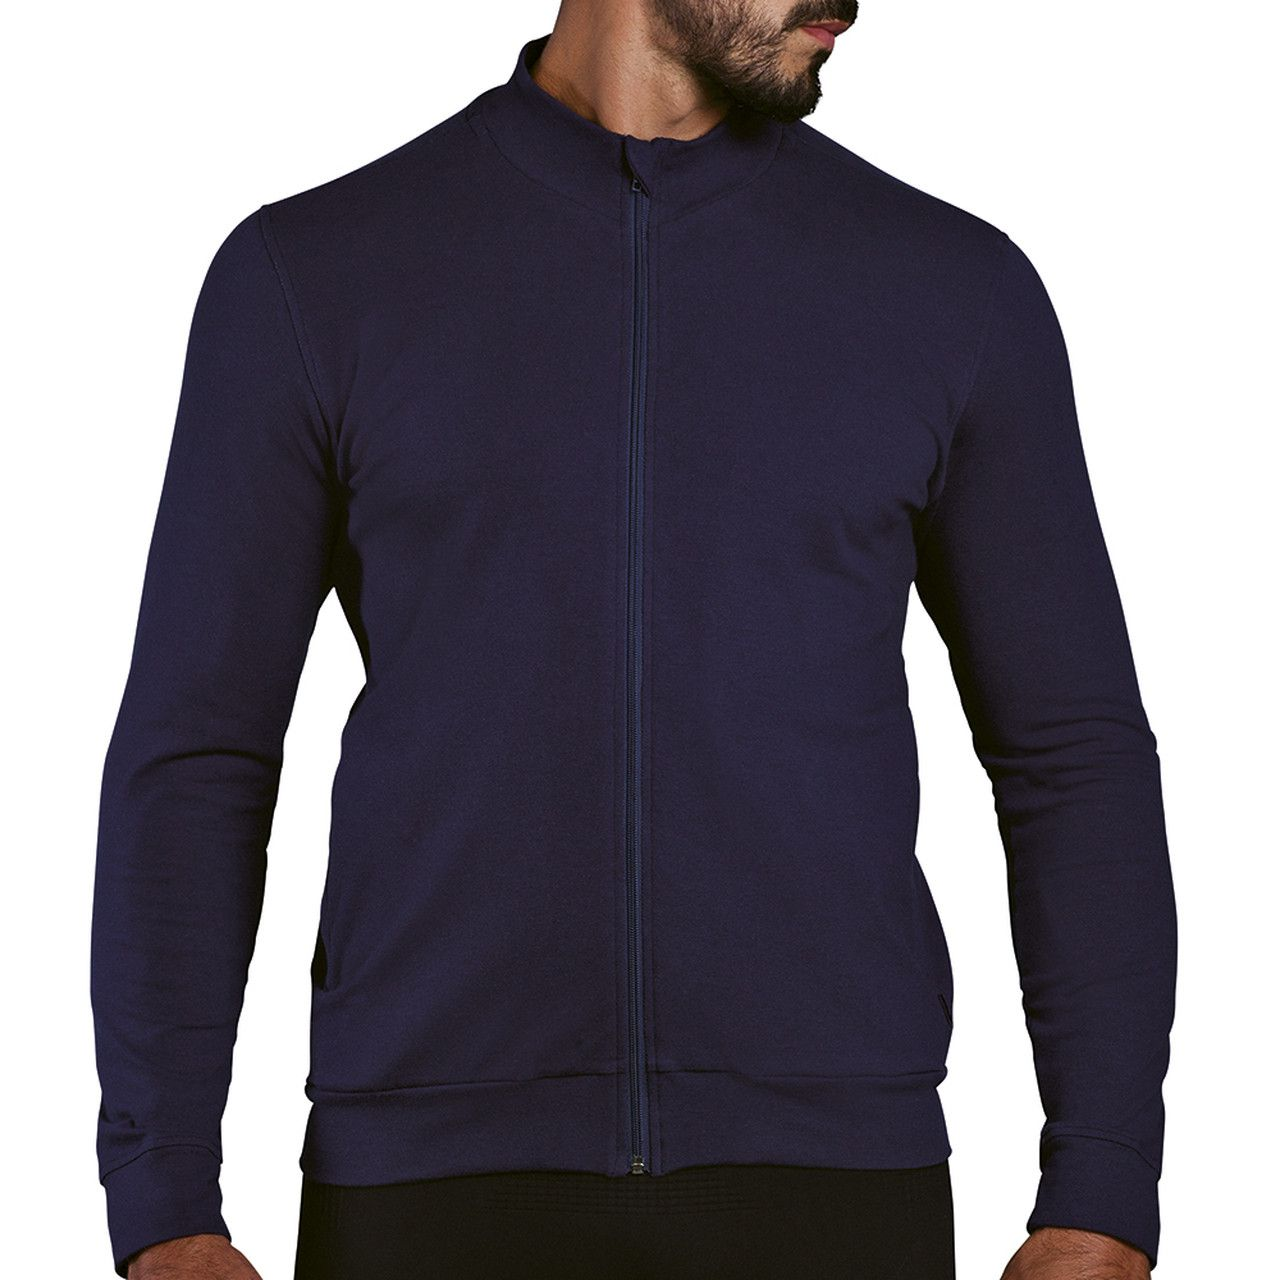 Jaqueta moletom esportiva inverno masculina ziper com bolso